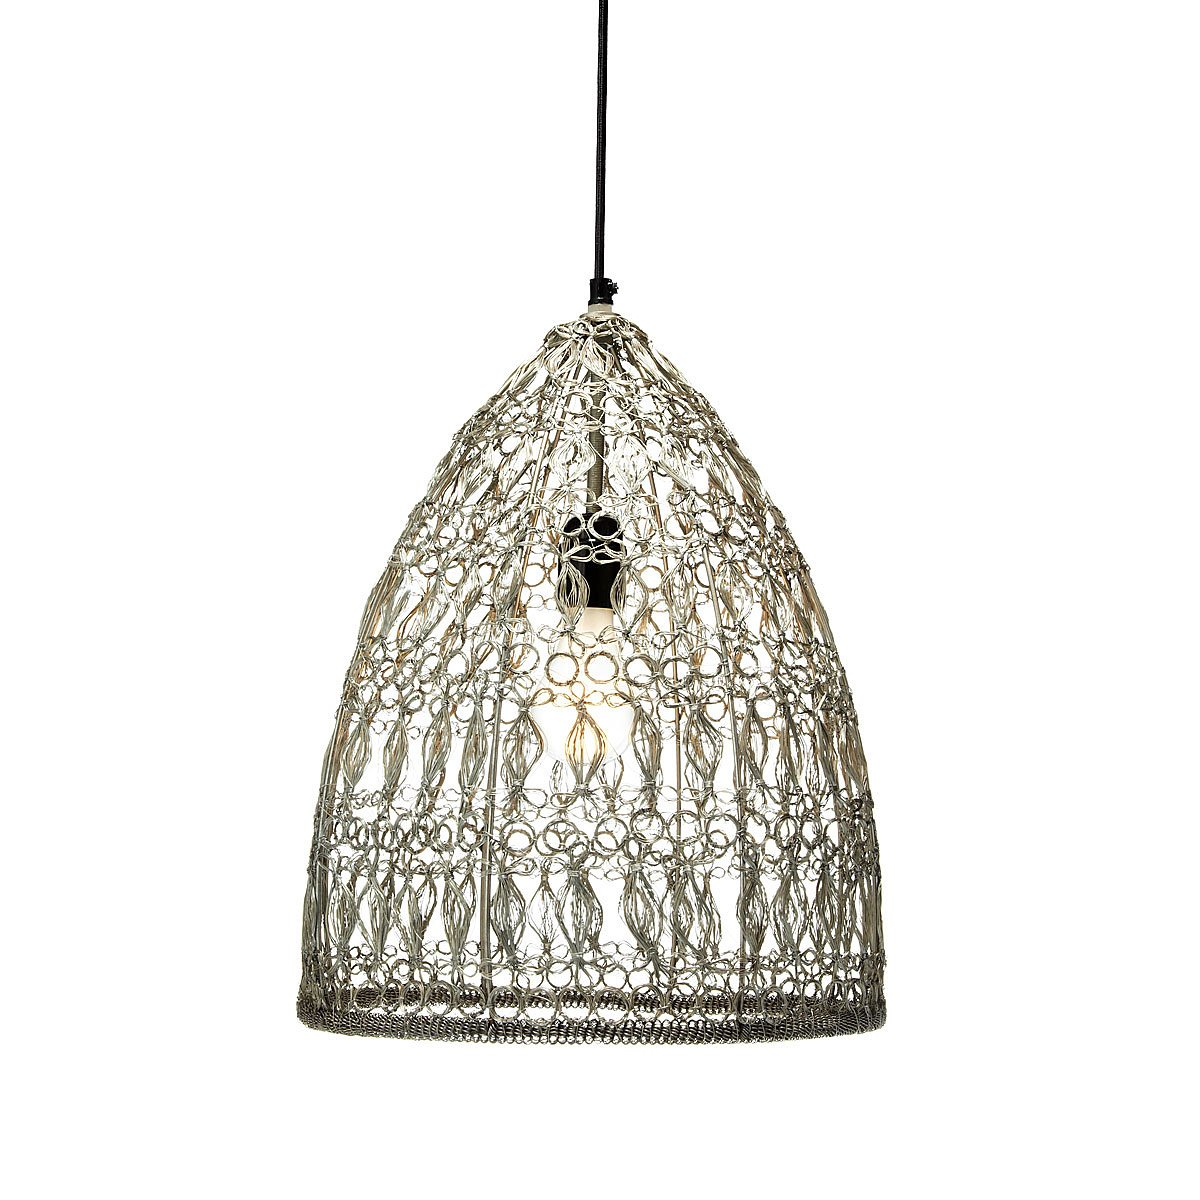 crochet wire pendant lamp pendant lamp handmade metal wire